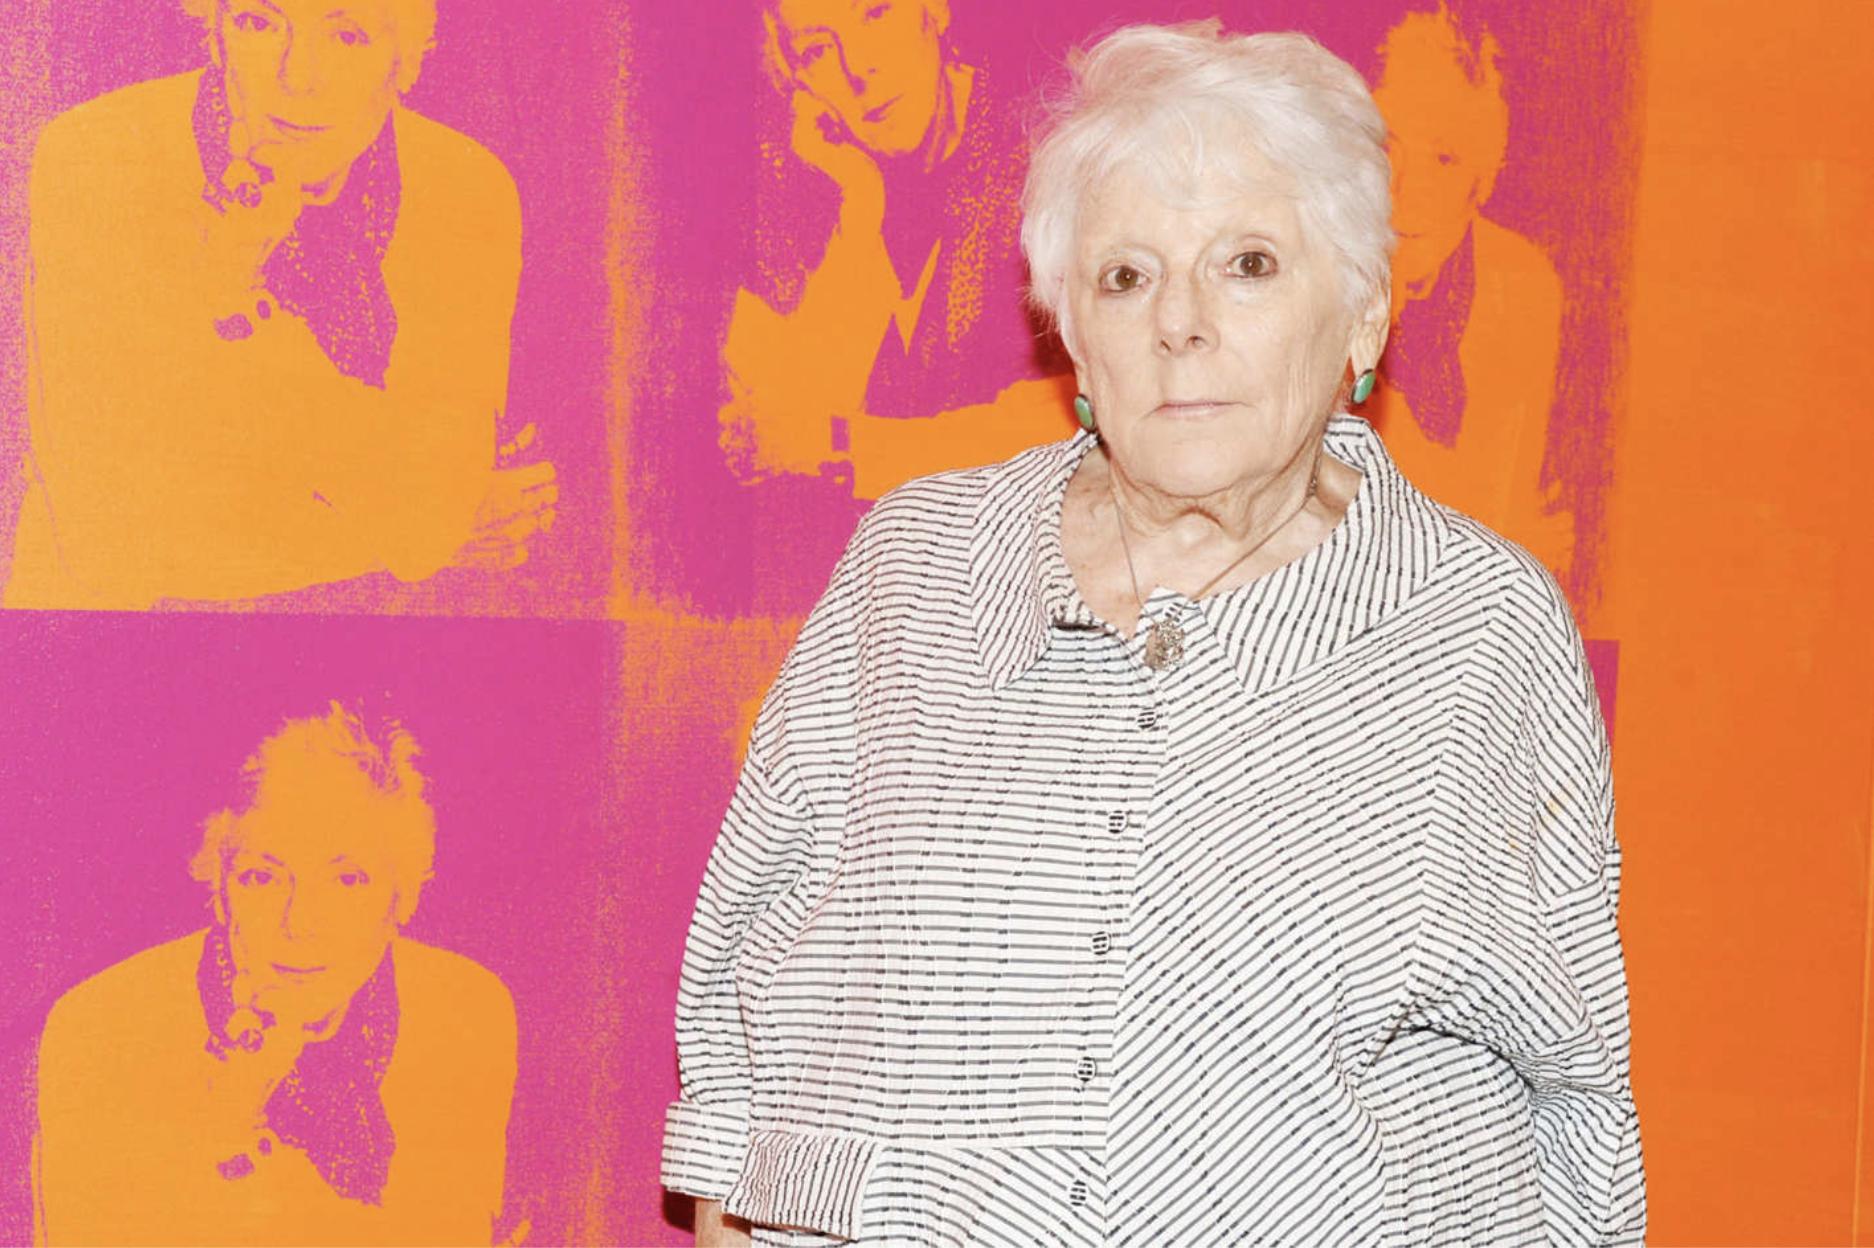 Linda Nochlin, standing in front of Deborah Kass's 1997 work  Orange Disaster (Linda Nochlin).